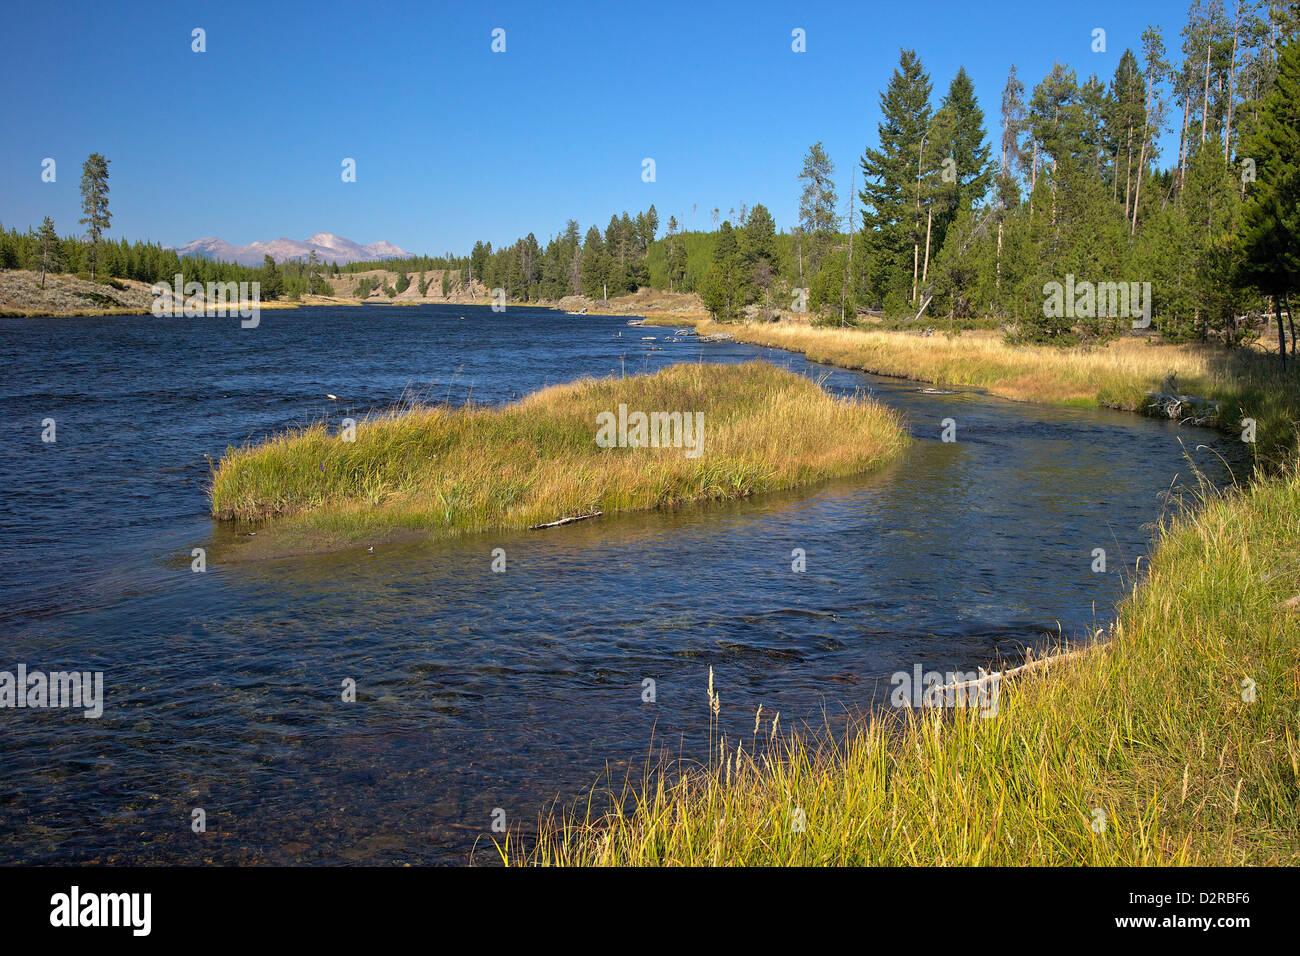 Madison River Valley in der Nähe von Madison, Yellowstone-Nationalpark, Wyoming, USA Stockbild